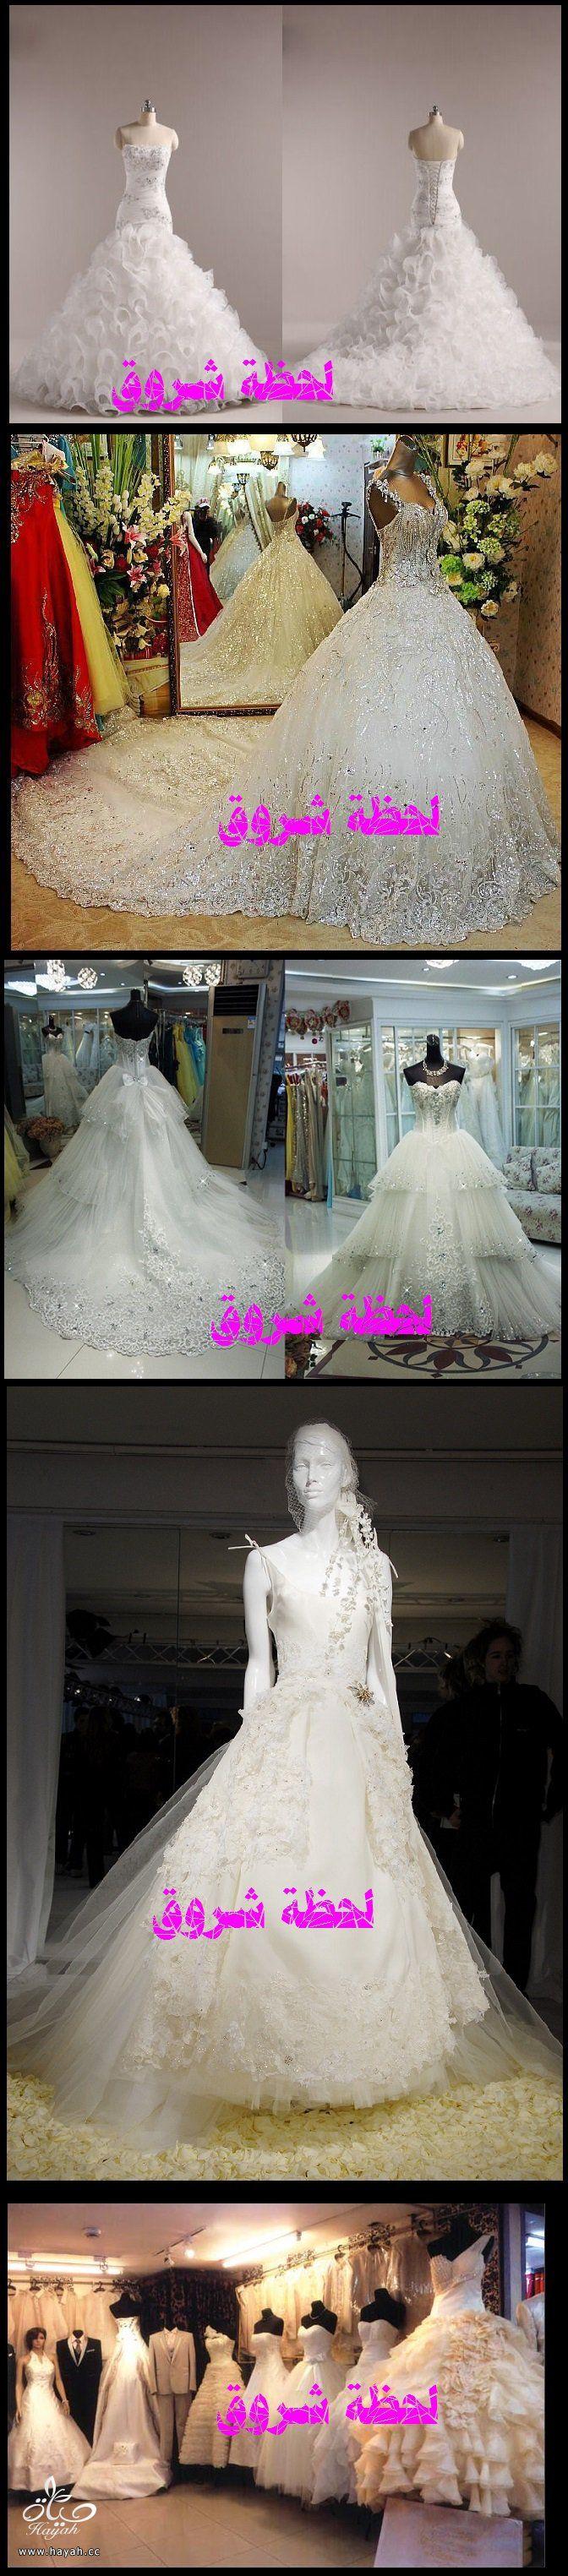 فساتين زفاف hayahcc_1474729762_265.jpg